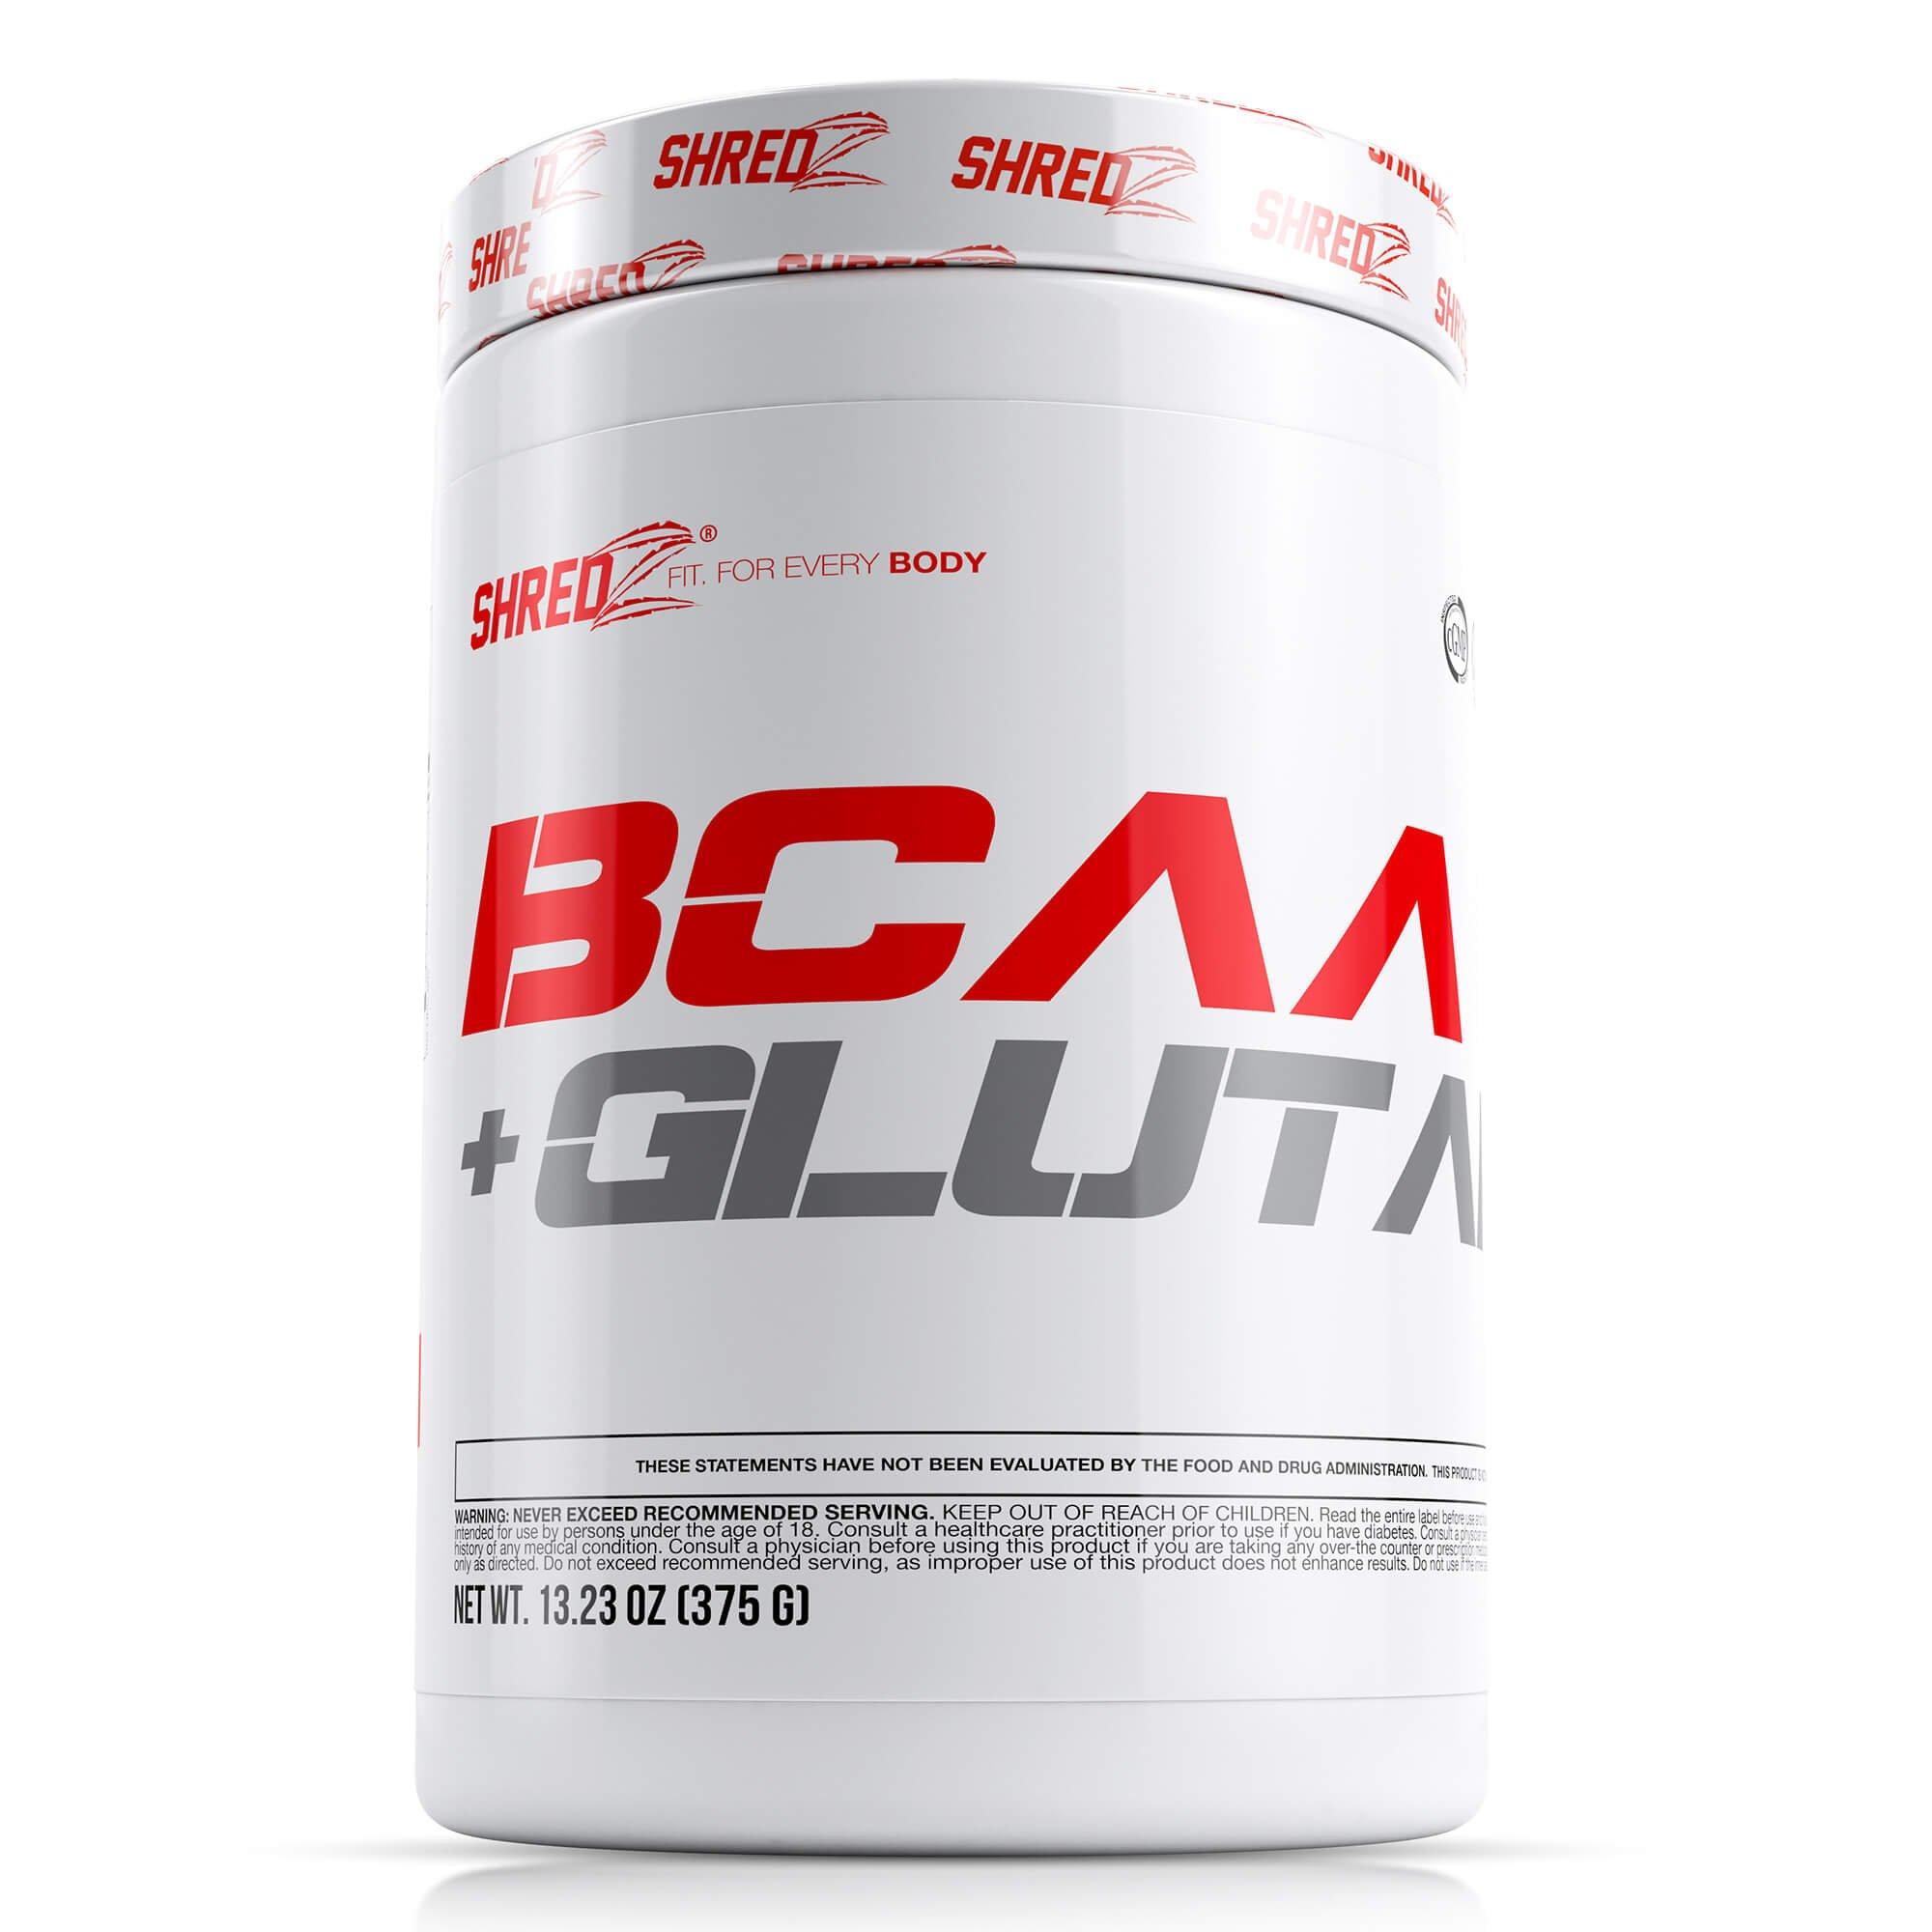 SHREDZ® BCAA + Glutamine: Workout Recovery, Enhance Mood, Boost Energy 13.23 oz (375g)